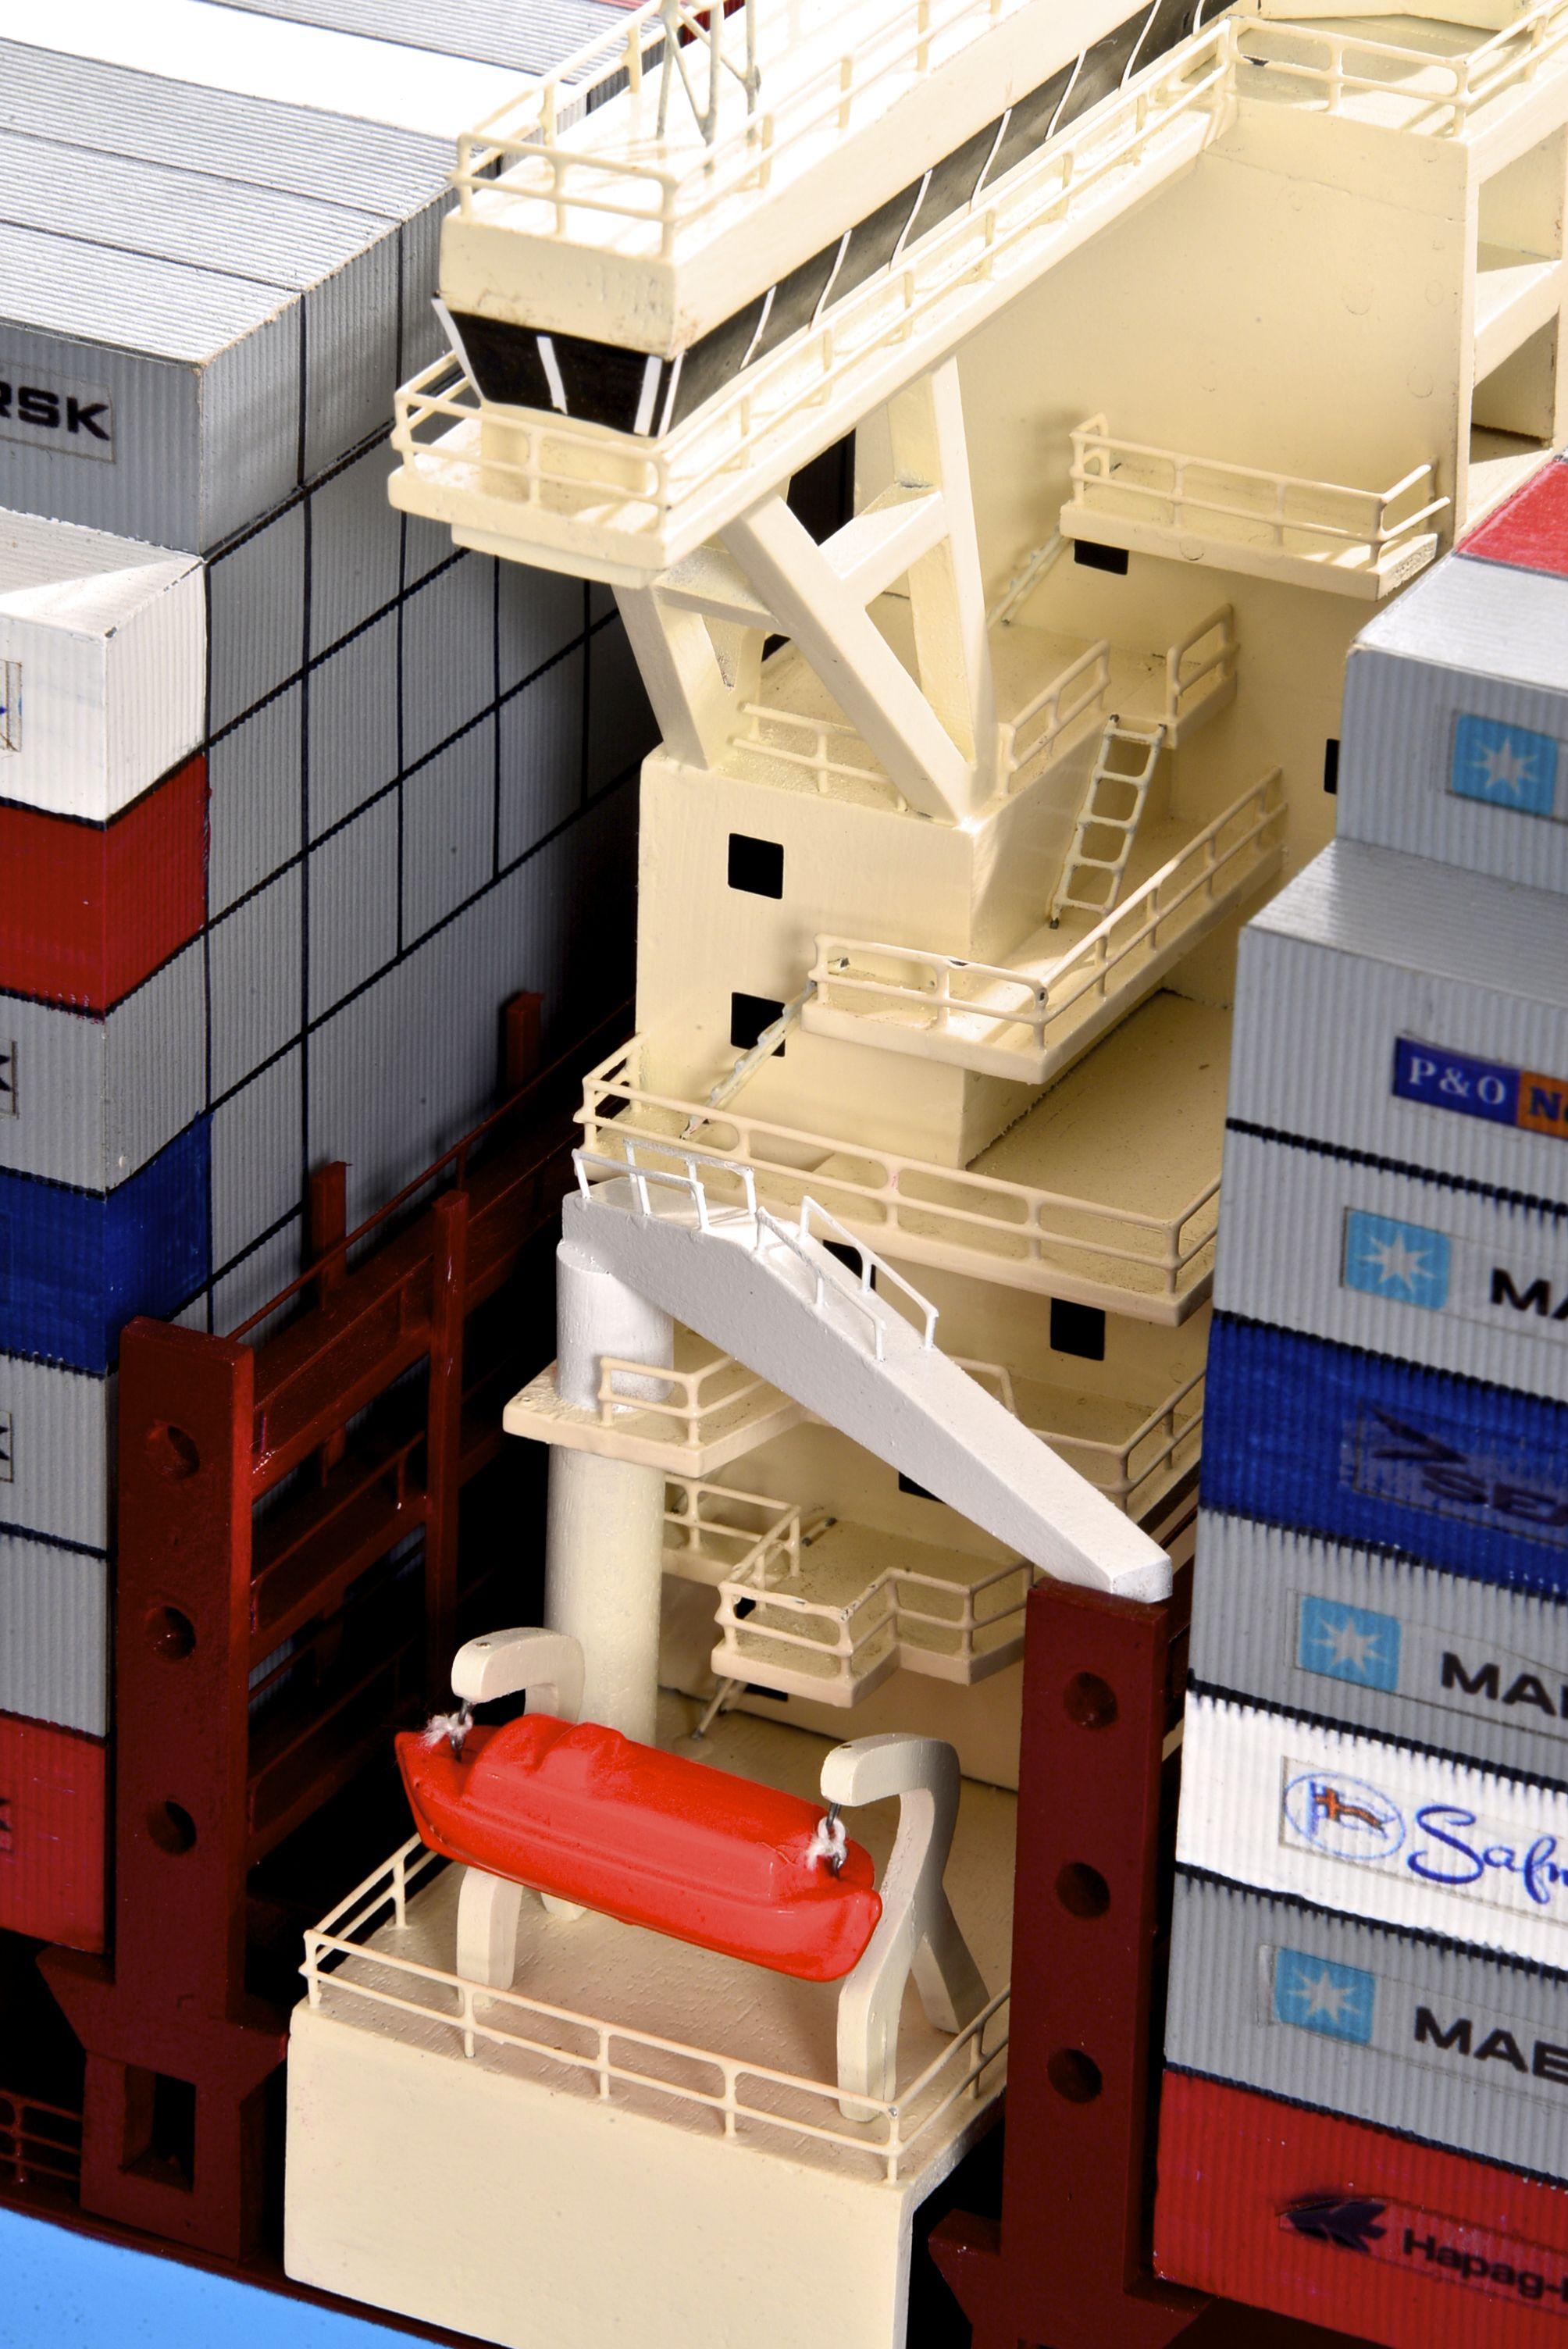 1812-10737-Emma-Maersk-Model-Ship